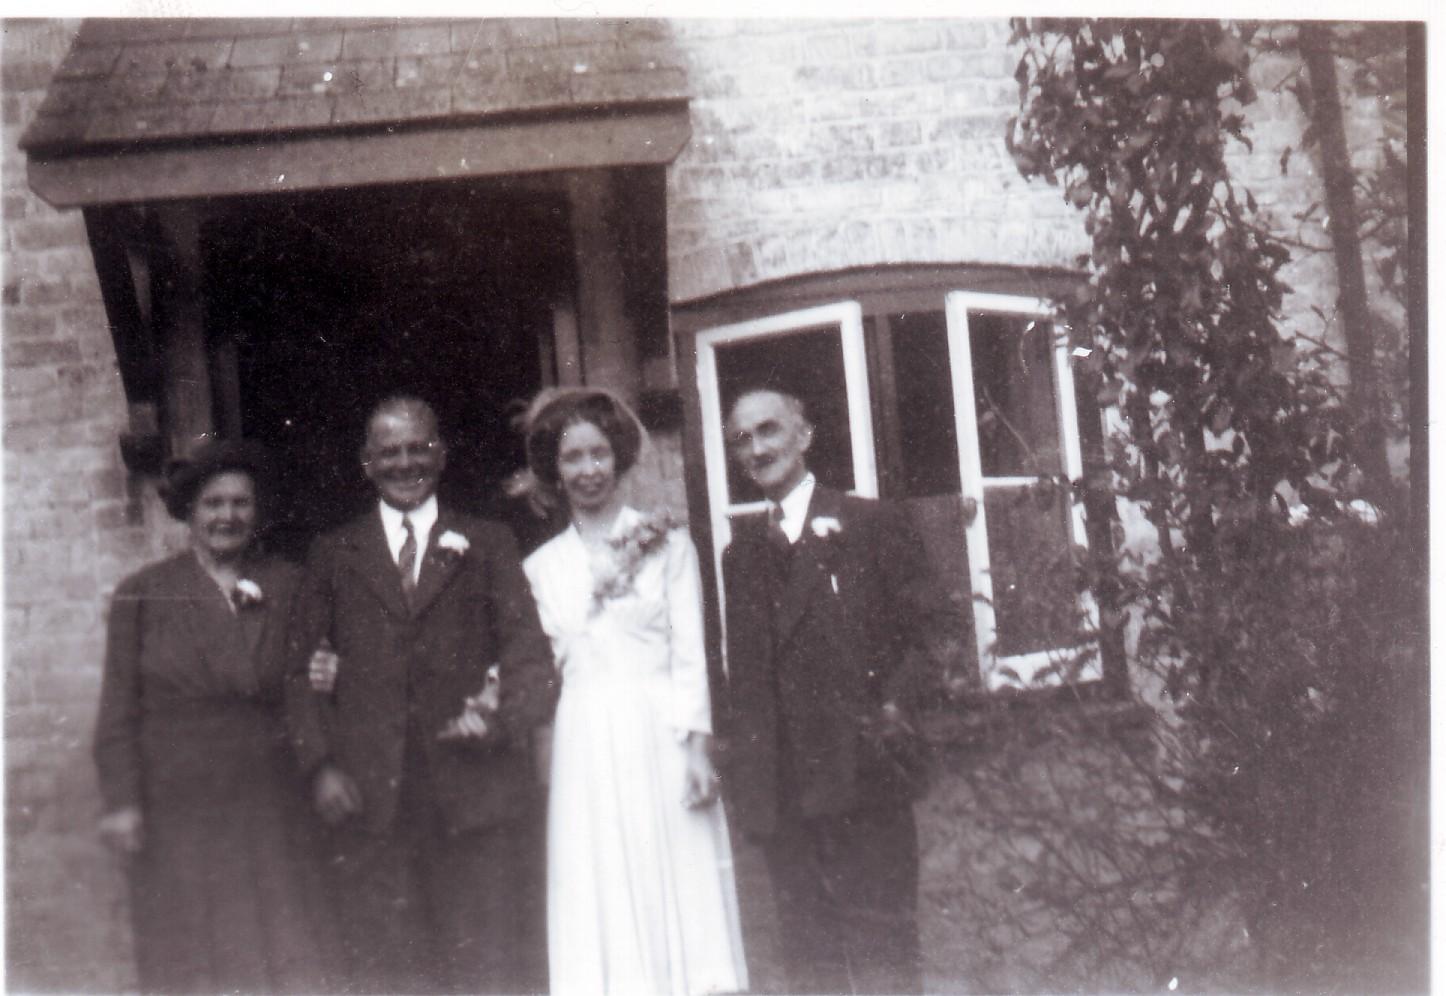 Norah & Eddie's Wedding, 1949